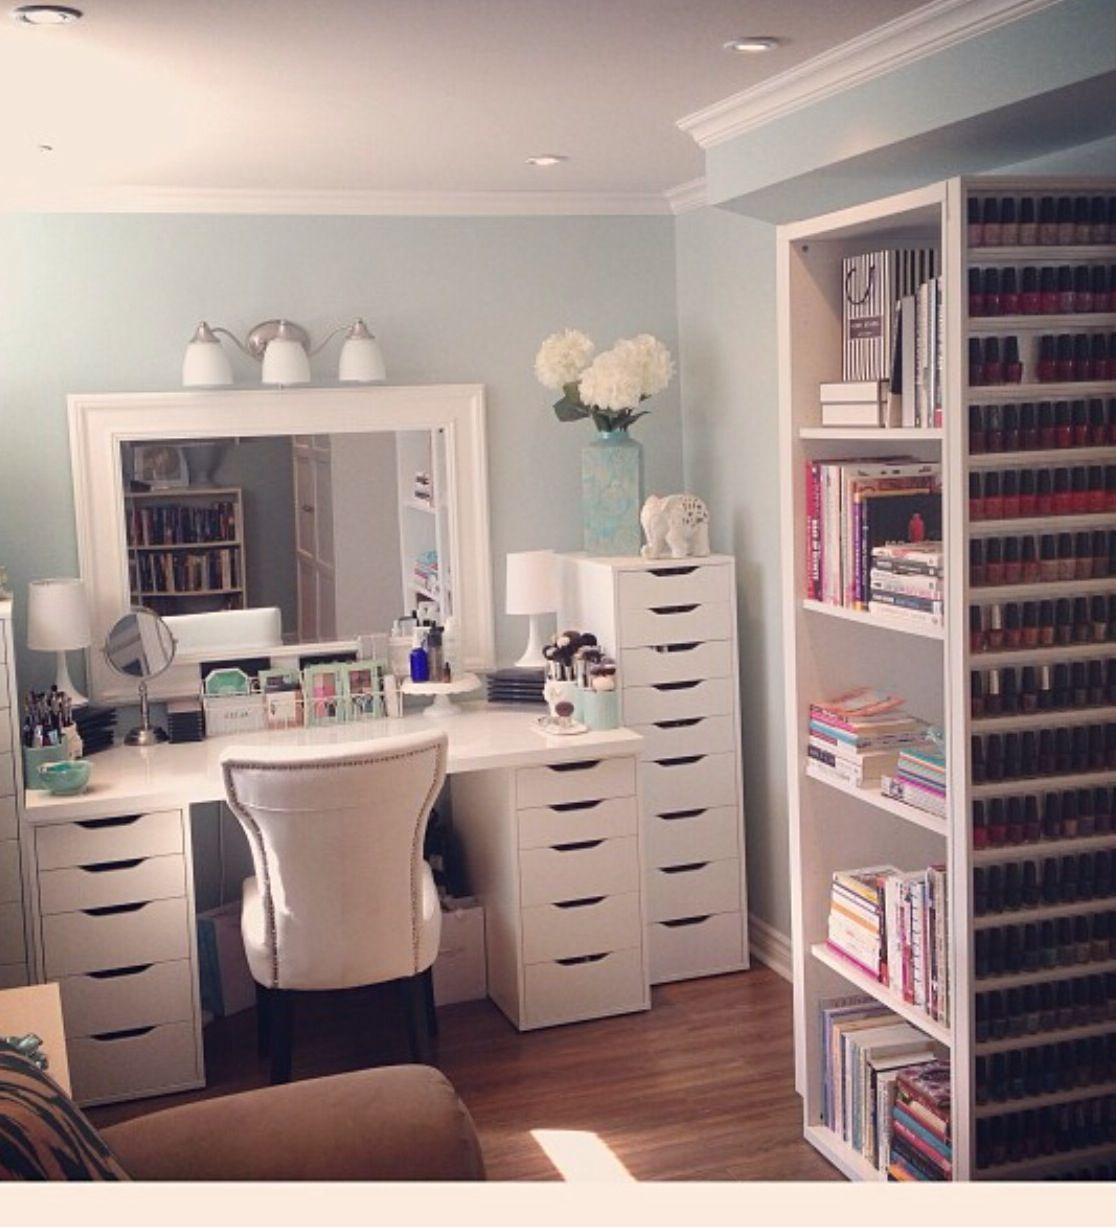 1000 images about decor house intery design on. Black Bedroom Furniture Sets. Home Design Ideas